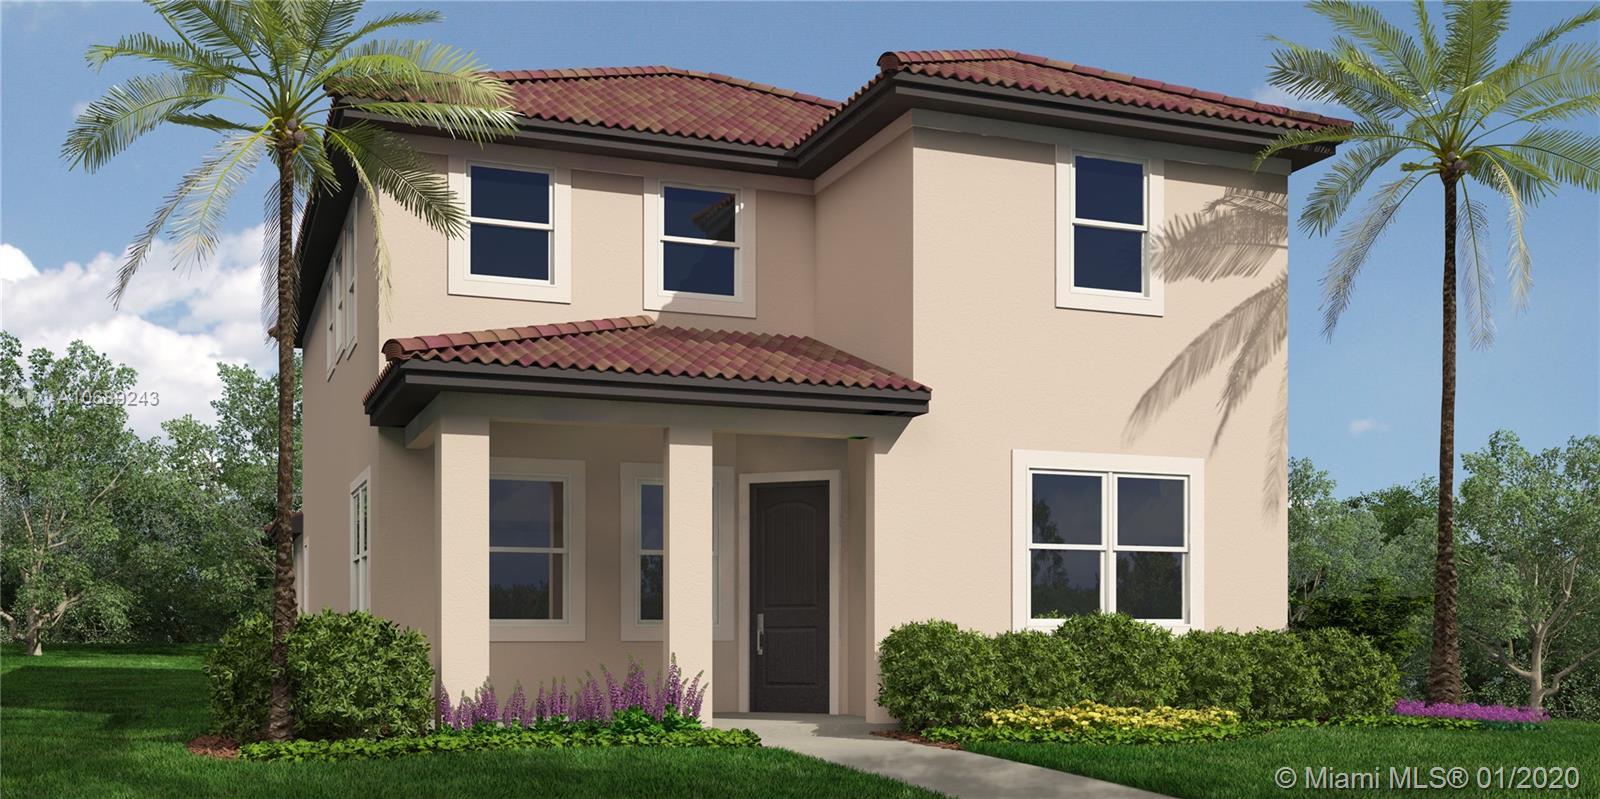 24302 SW 117th Path, Homestead, FL 33032 - Homestead, FL real estate listing